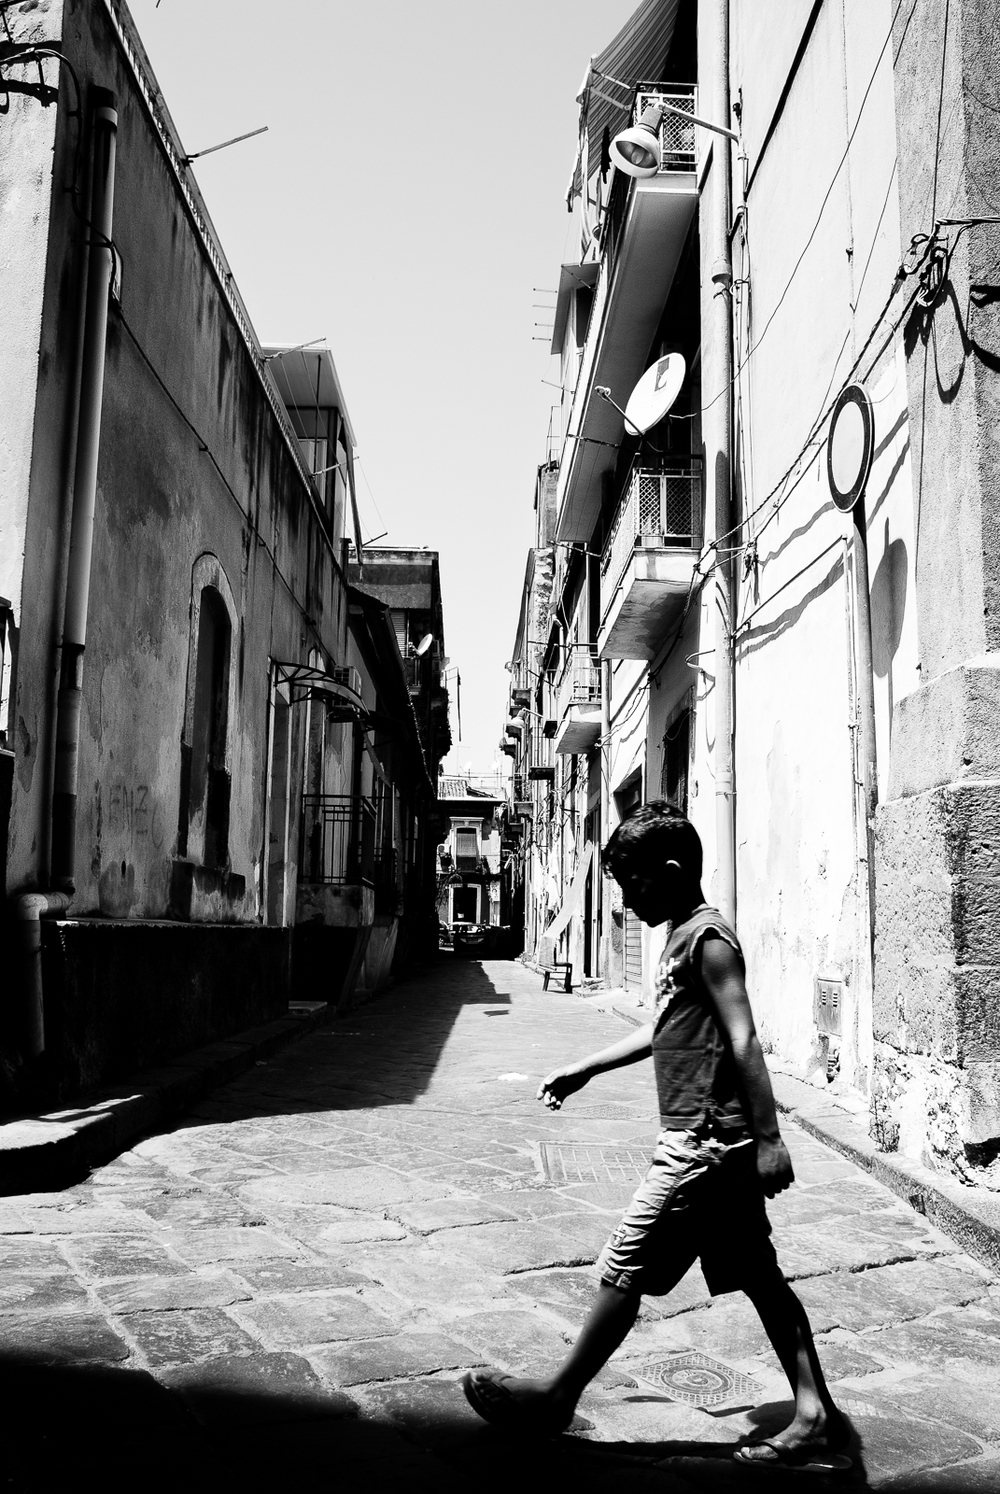 Catania's streets